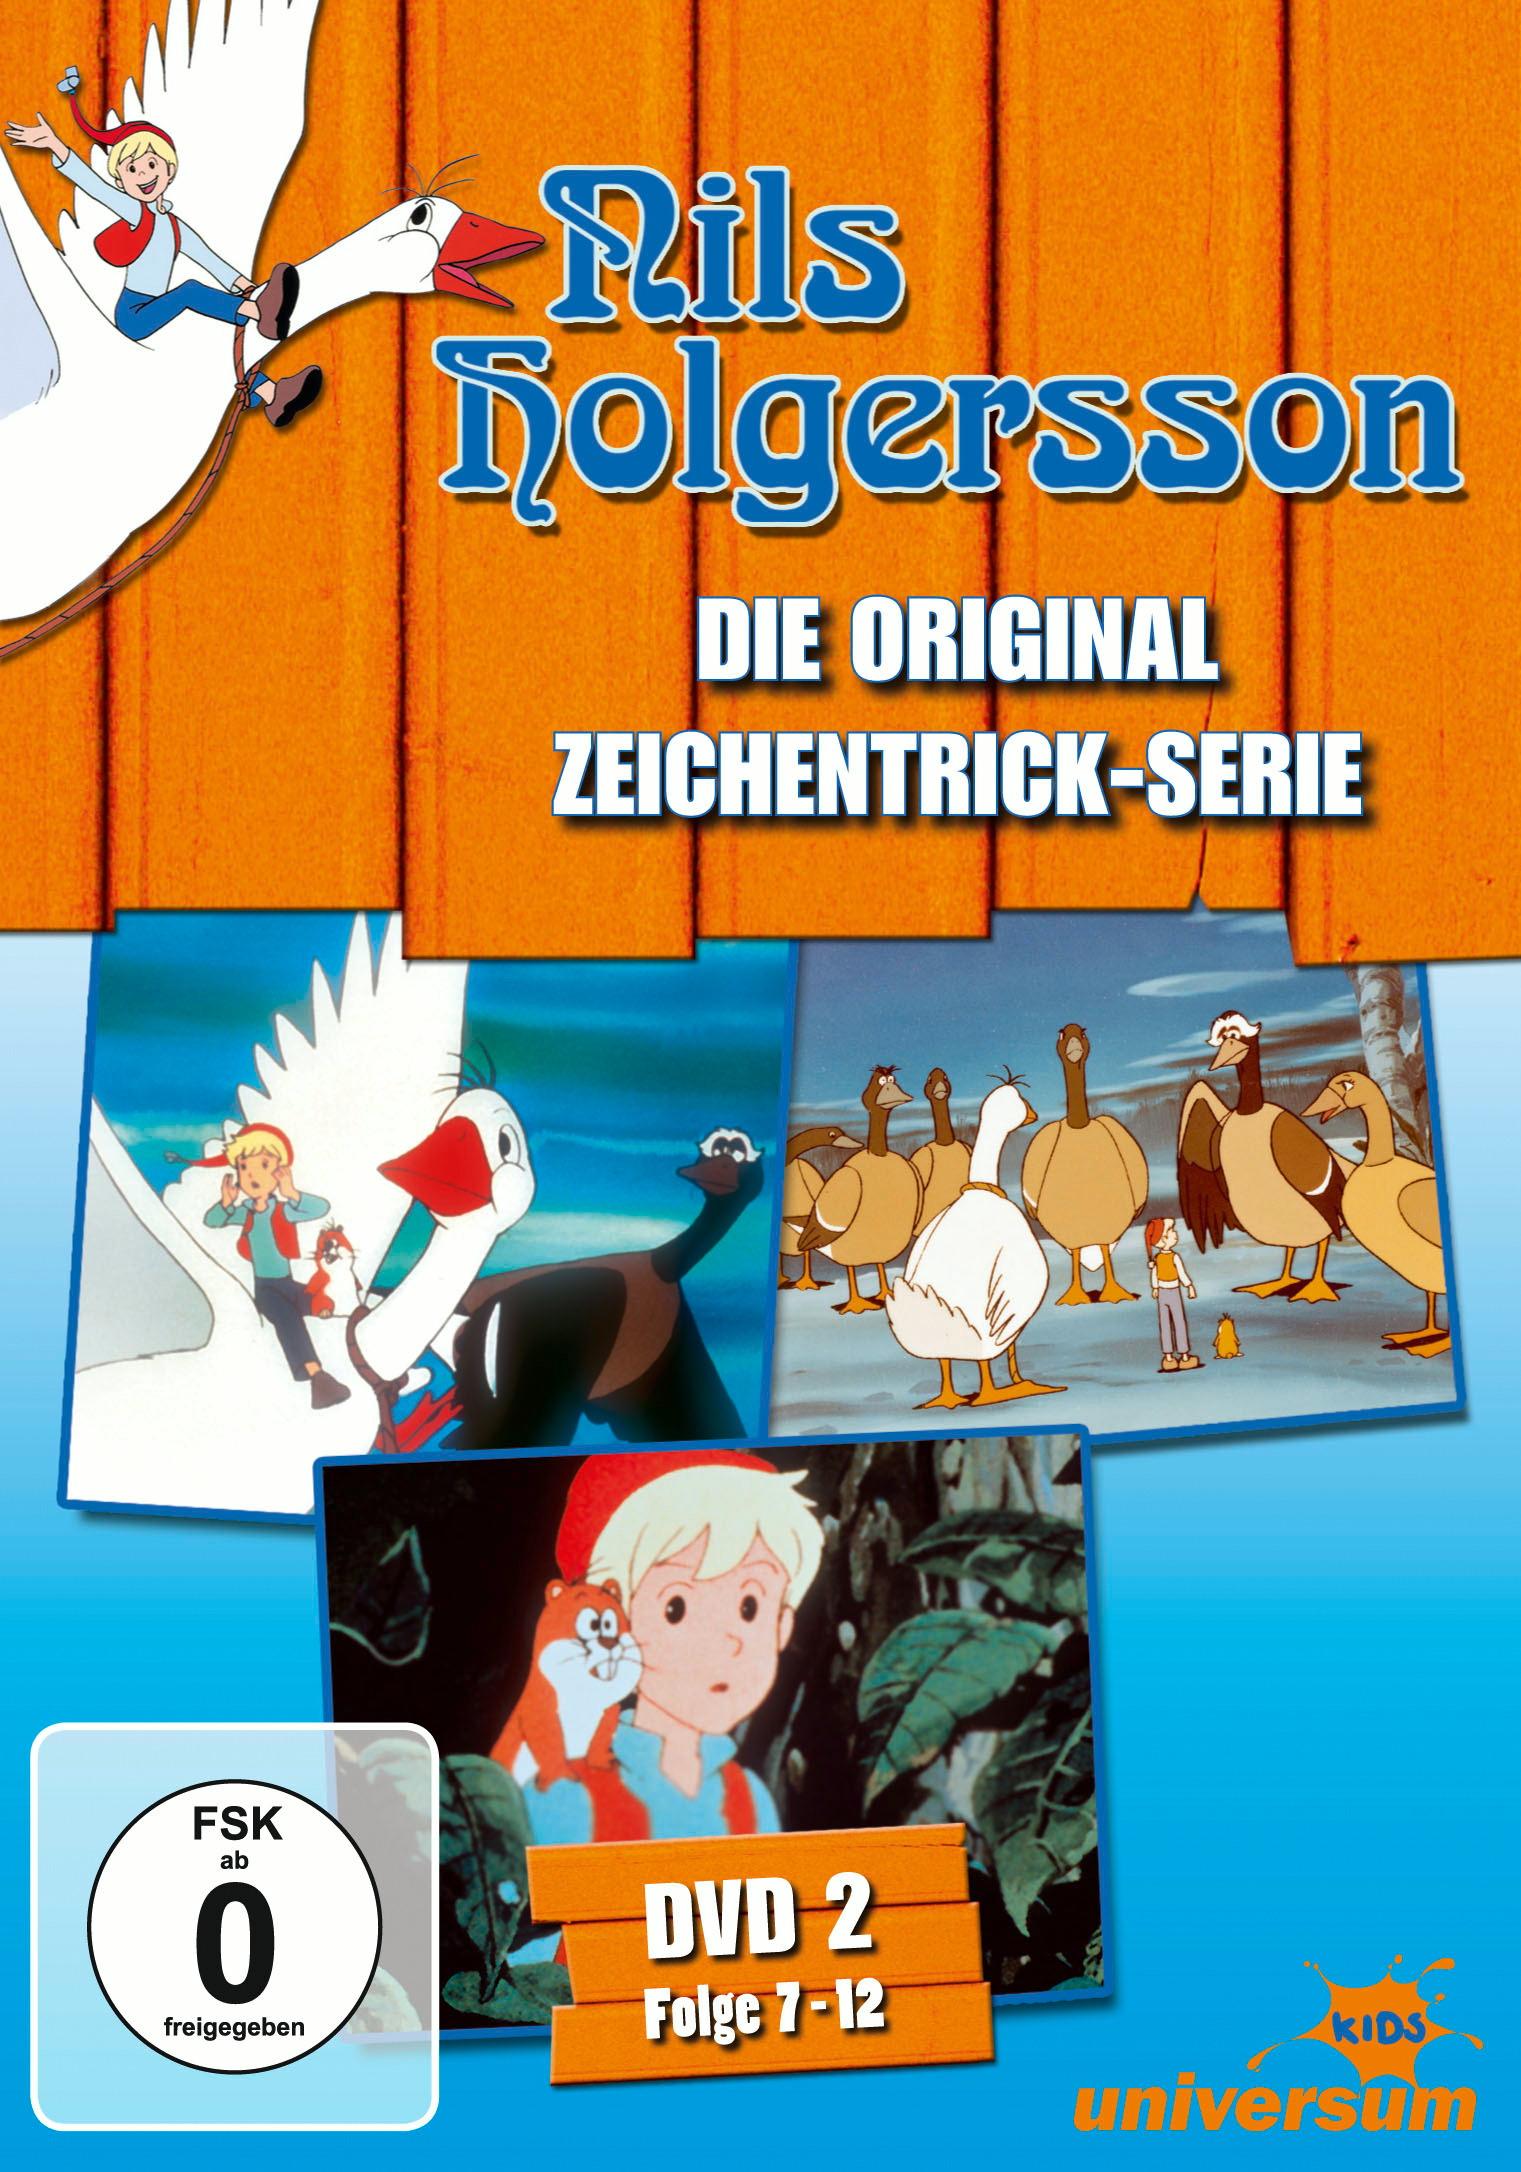 Nils Holgersson - DVD 02 (Folgen 7-12) Poster